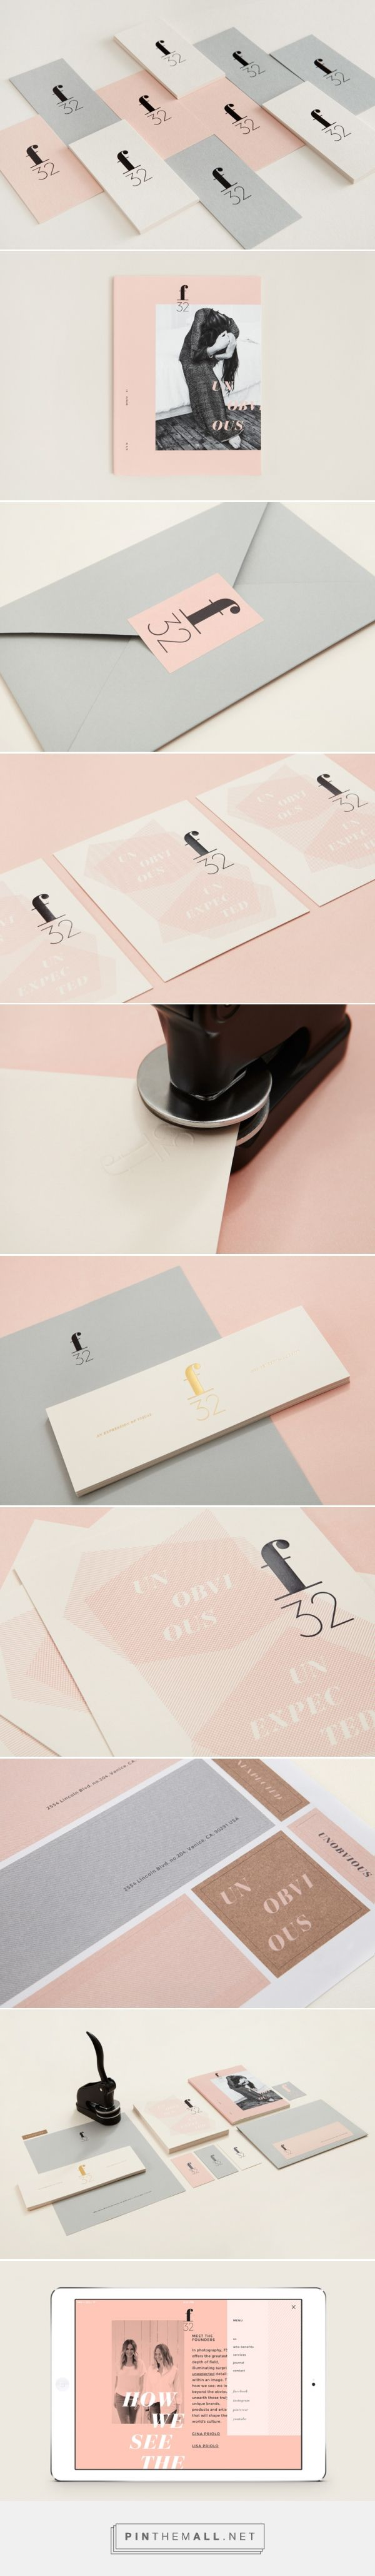 branding corporate identity stationary minimalistic graphic design sticker business card letterhead magazine cover website